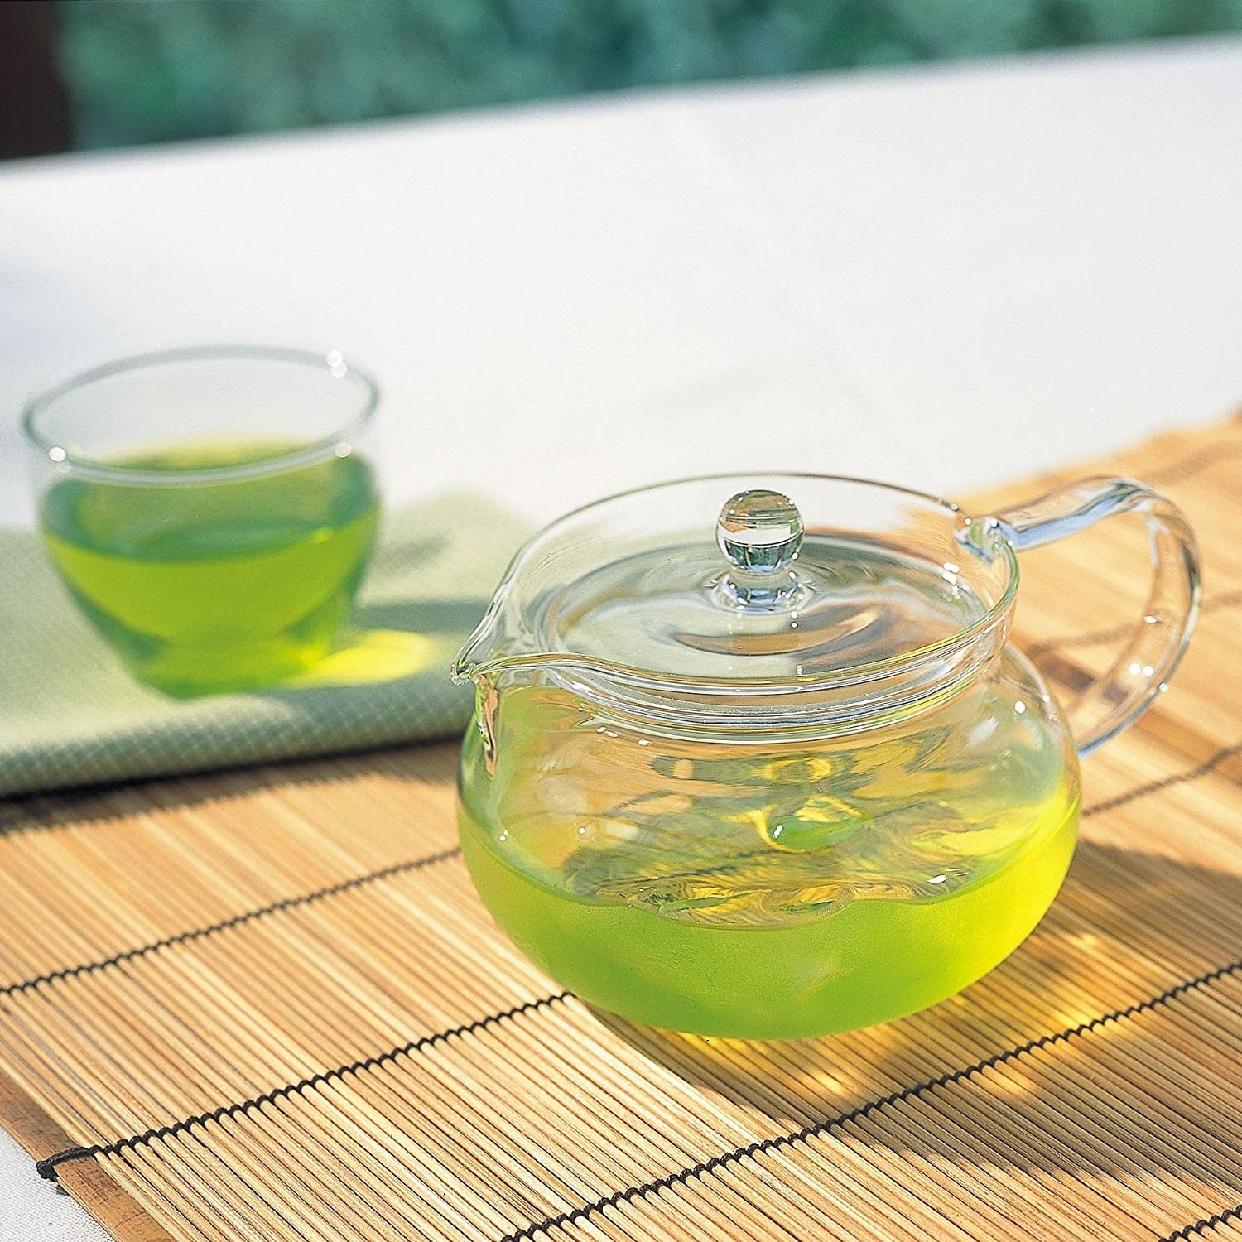 HARIO(ハリオ) 茶茶急須 丸 CHJMN-45T クリアの商品画像14